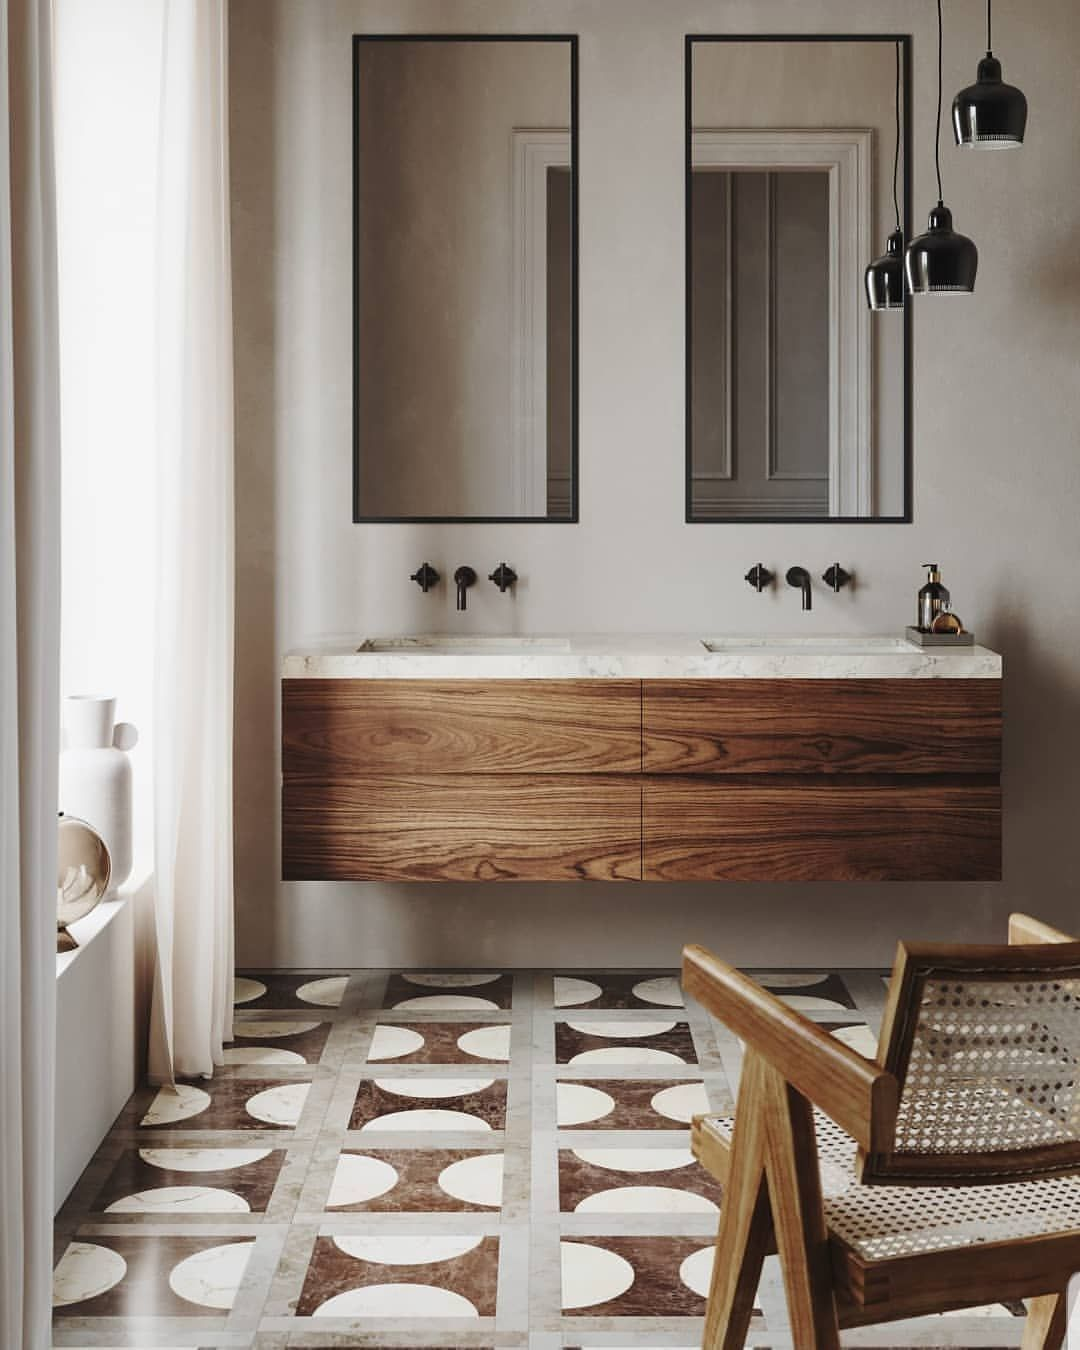 Stunning Photo Via Est Living Bathroom Tile Inspiration Unique Bathroom Industrial Style Bathroom